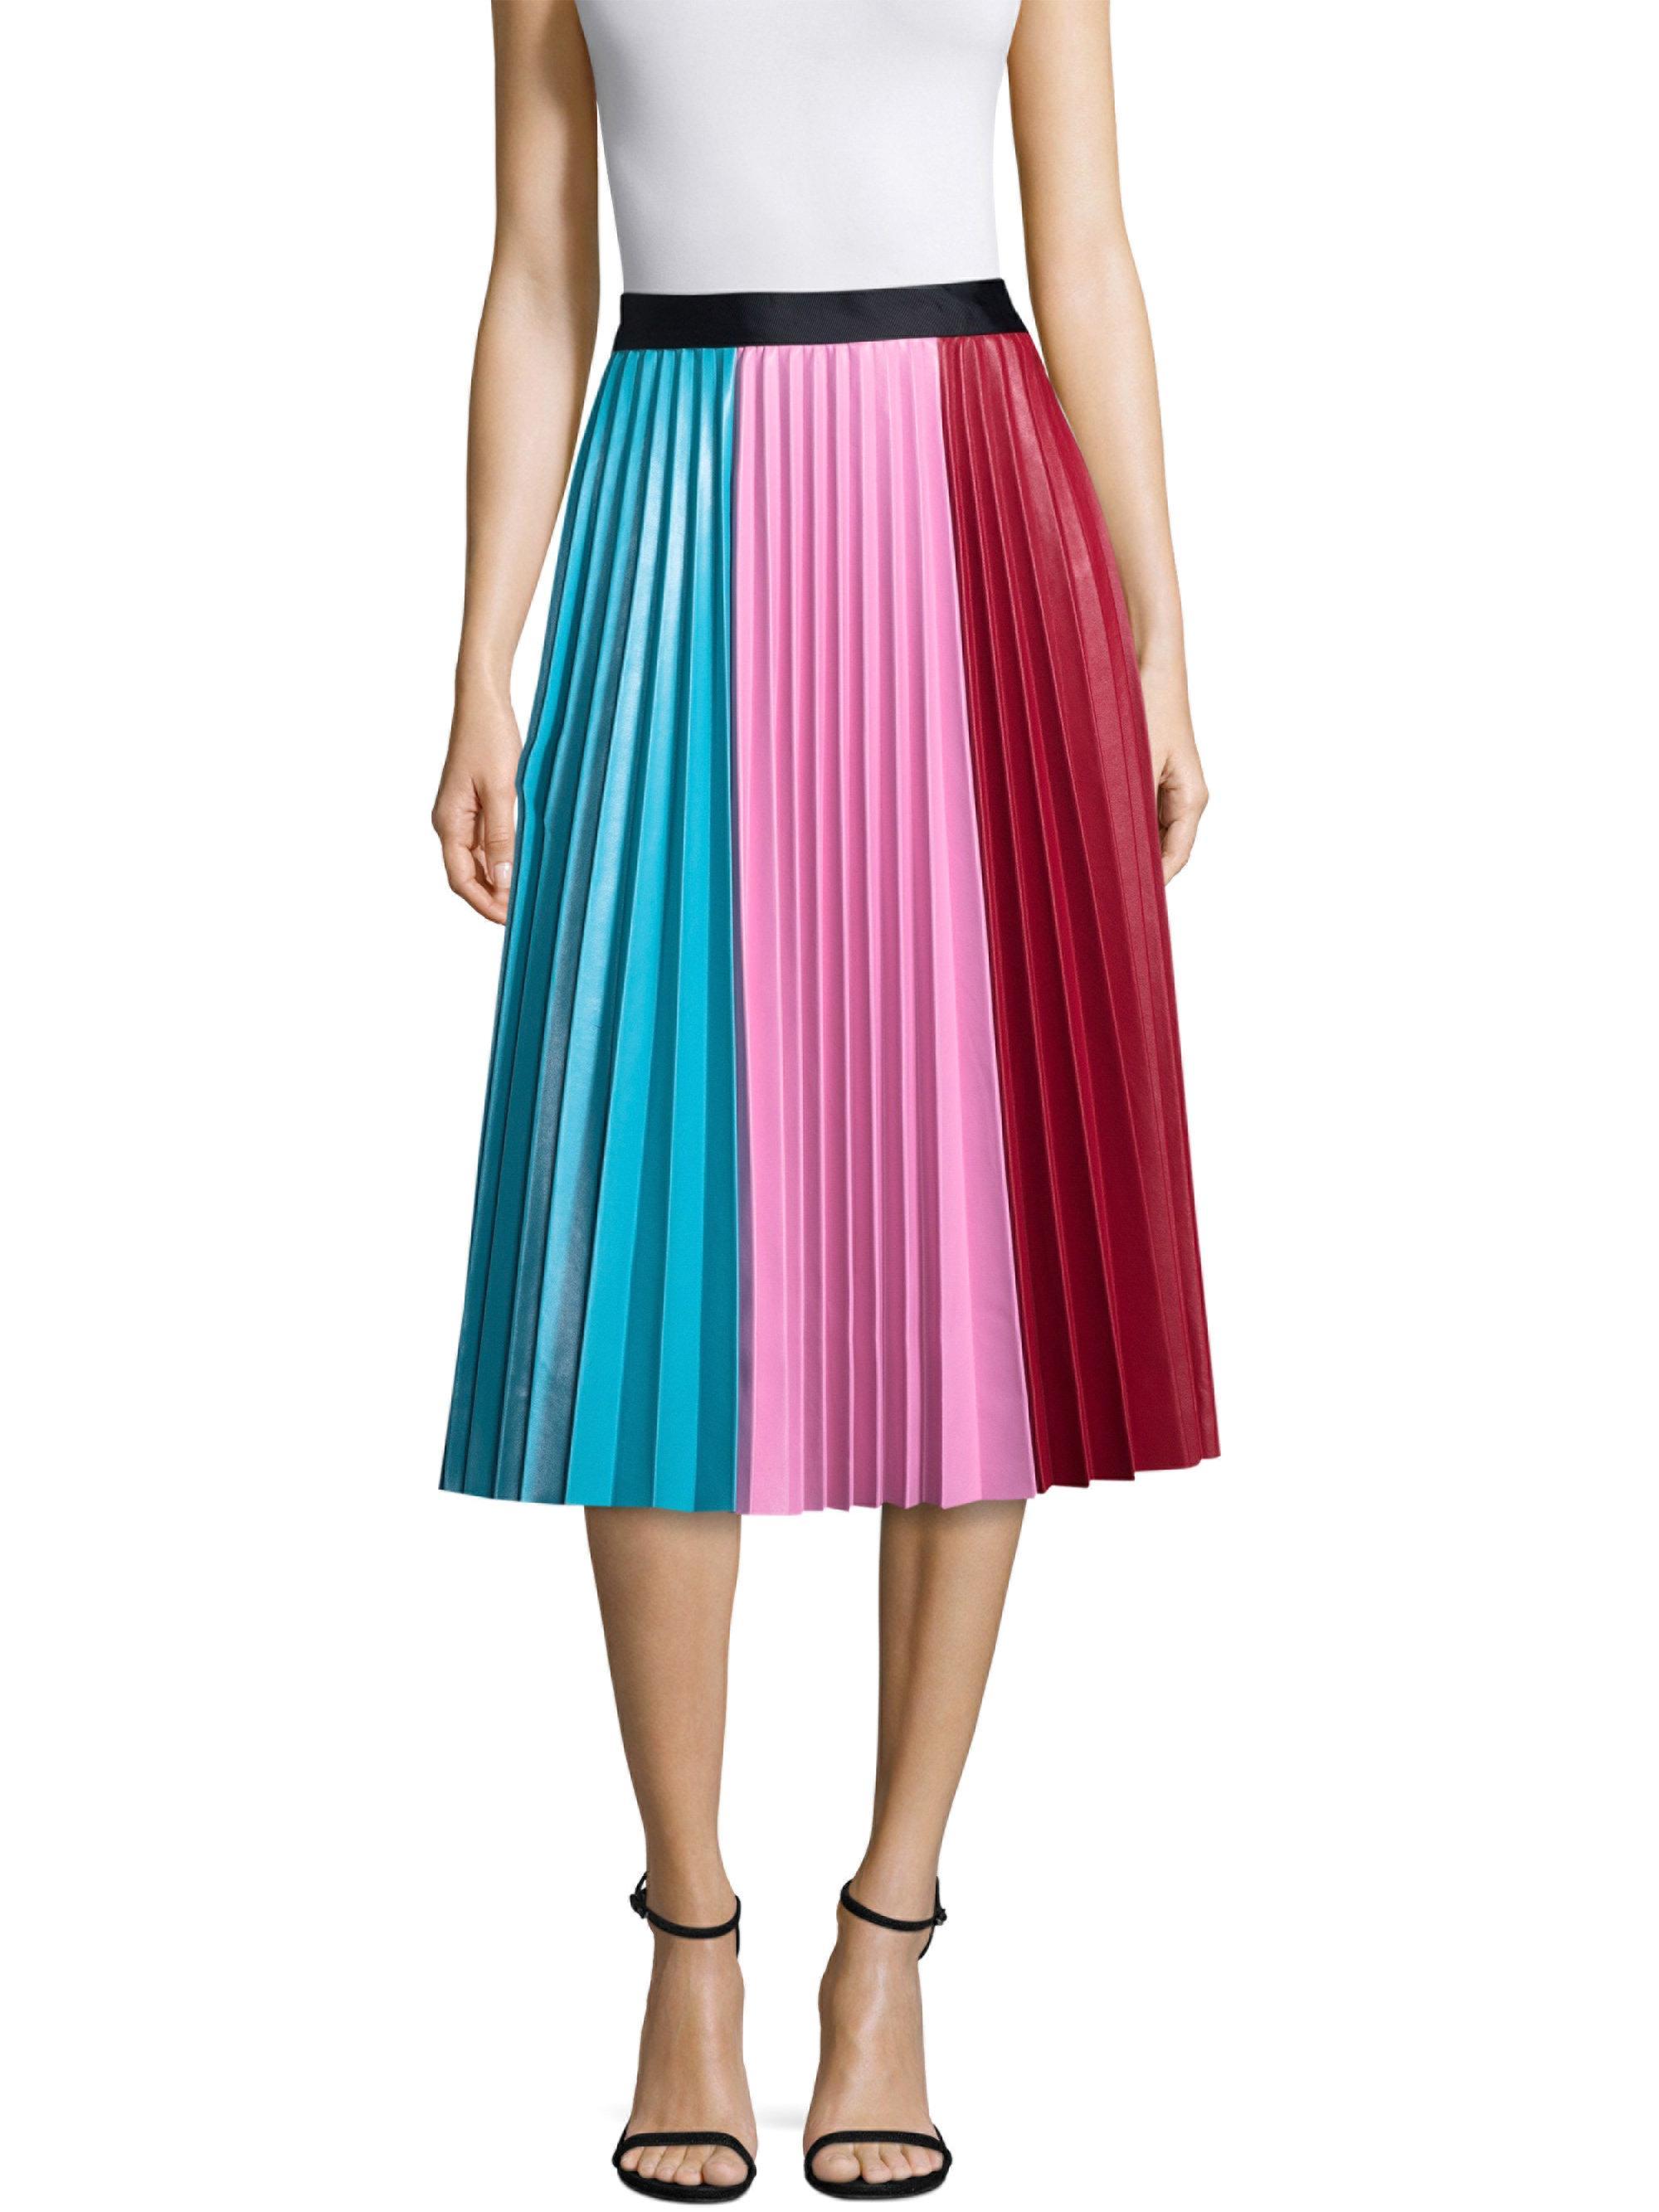 fortune teller pleat skirt - Multicolour Romance Was Born Latest Sale Websites OQkP1r4